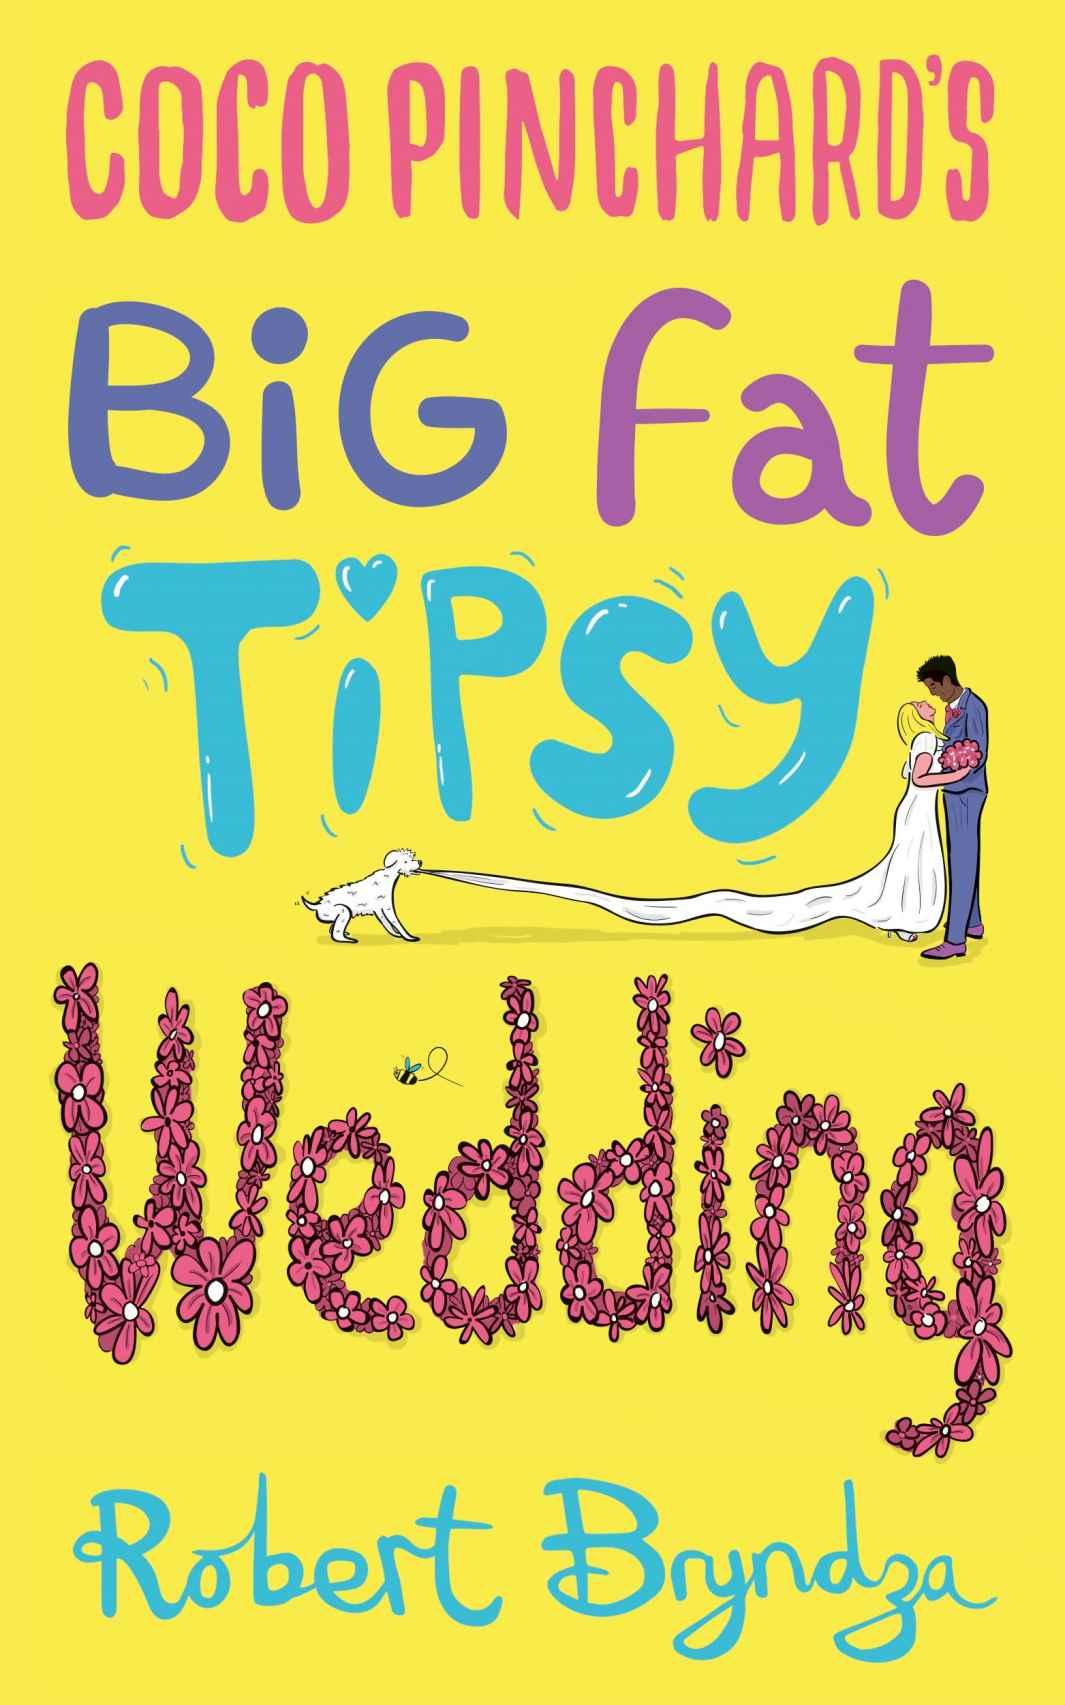 Very Funny Book - Robert Bryndza - Coco Pinchard's Big Fat Tipsy Wedding - Free @ Amazon Kindle